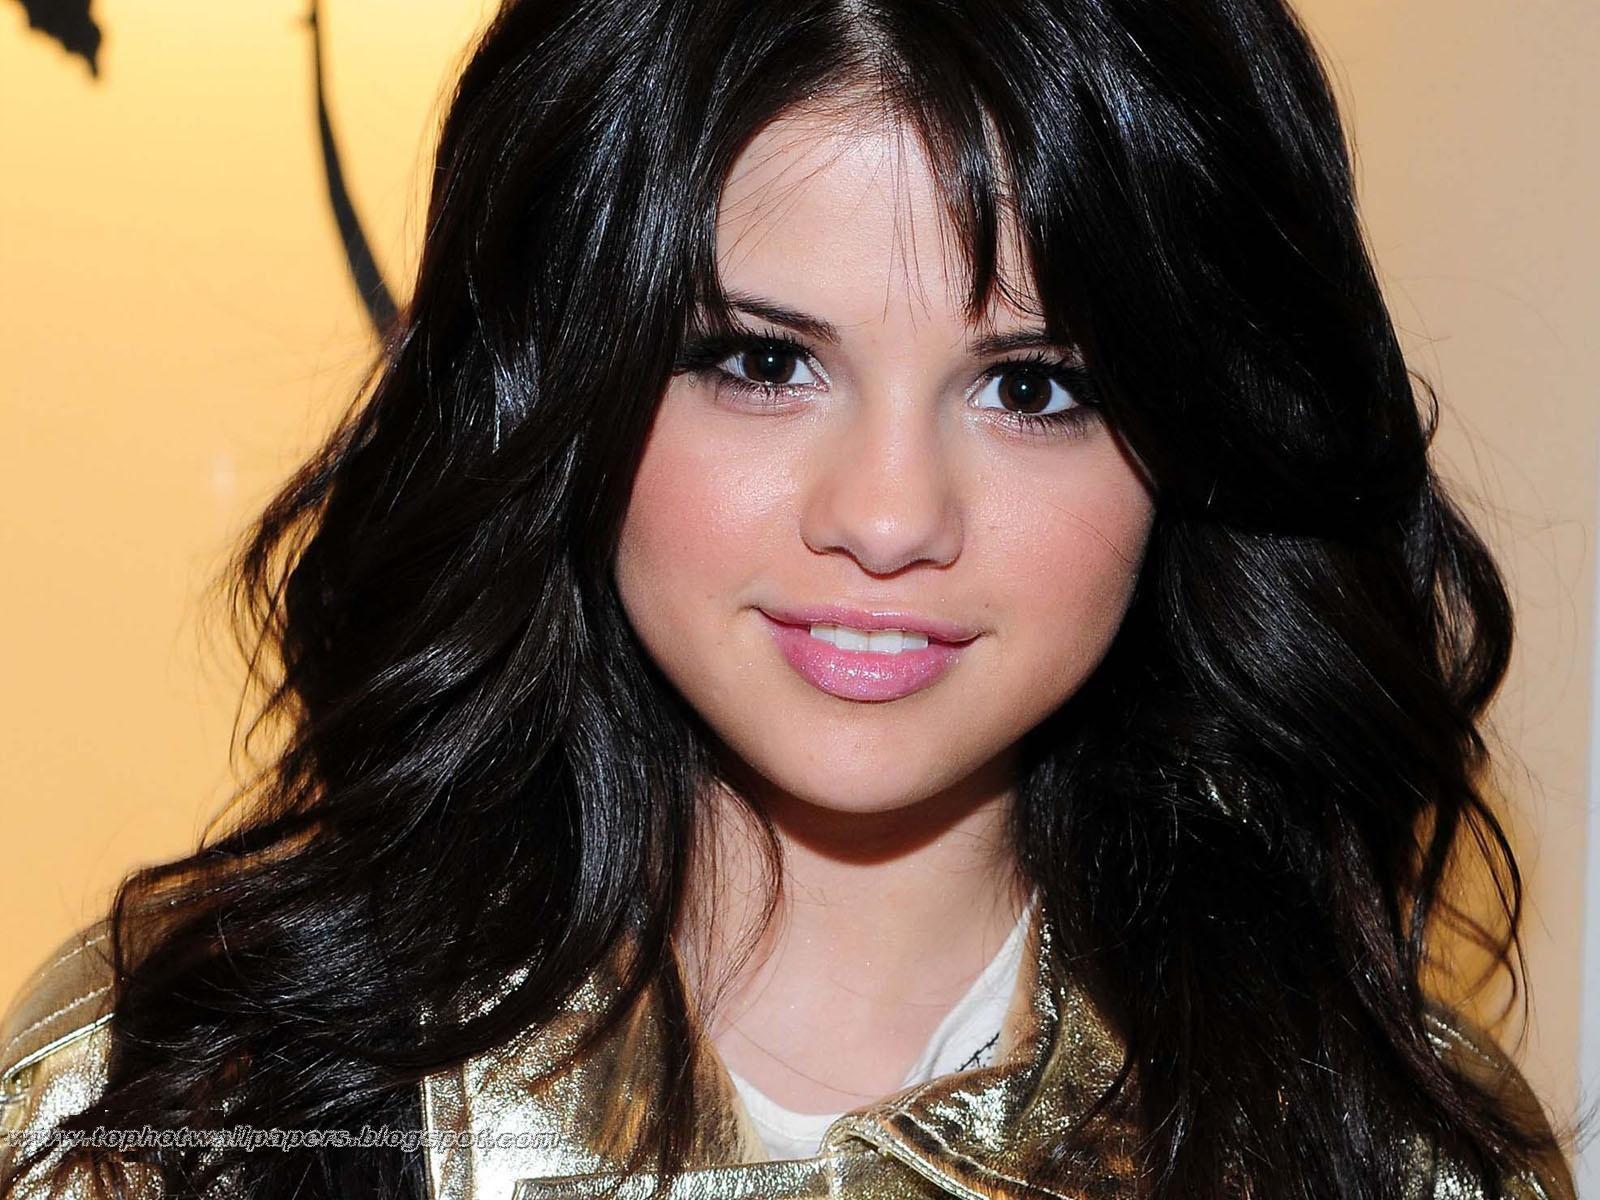 http://4.bp.blogspot.com/-Mnr88U6goII/TqxmTfgIdYI/AAAAAAAAAUc/xXJXUWSkotc/s1600/Selena%2BGomez%2BMonte%2BCarlo%2BWallpaper.jpg